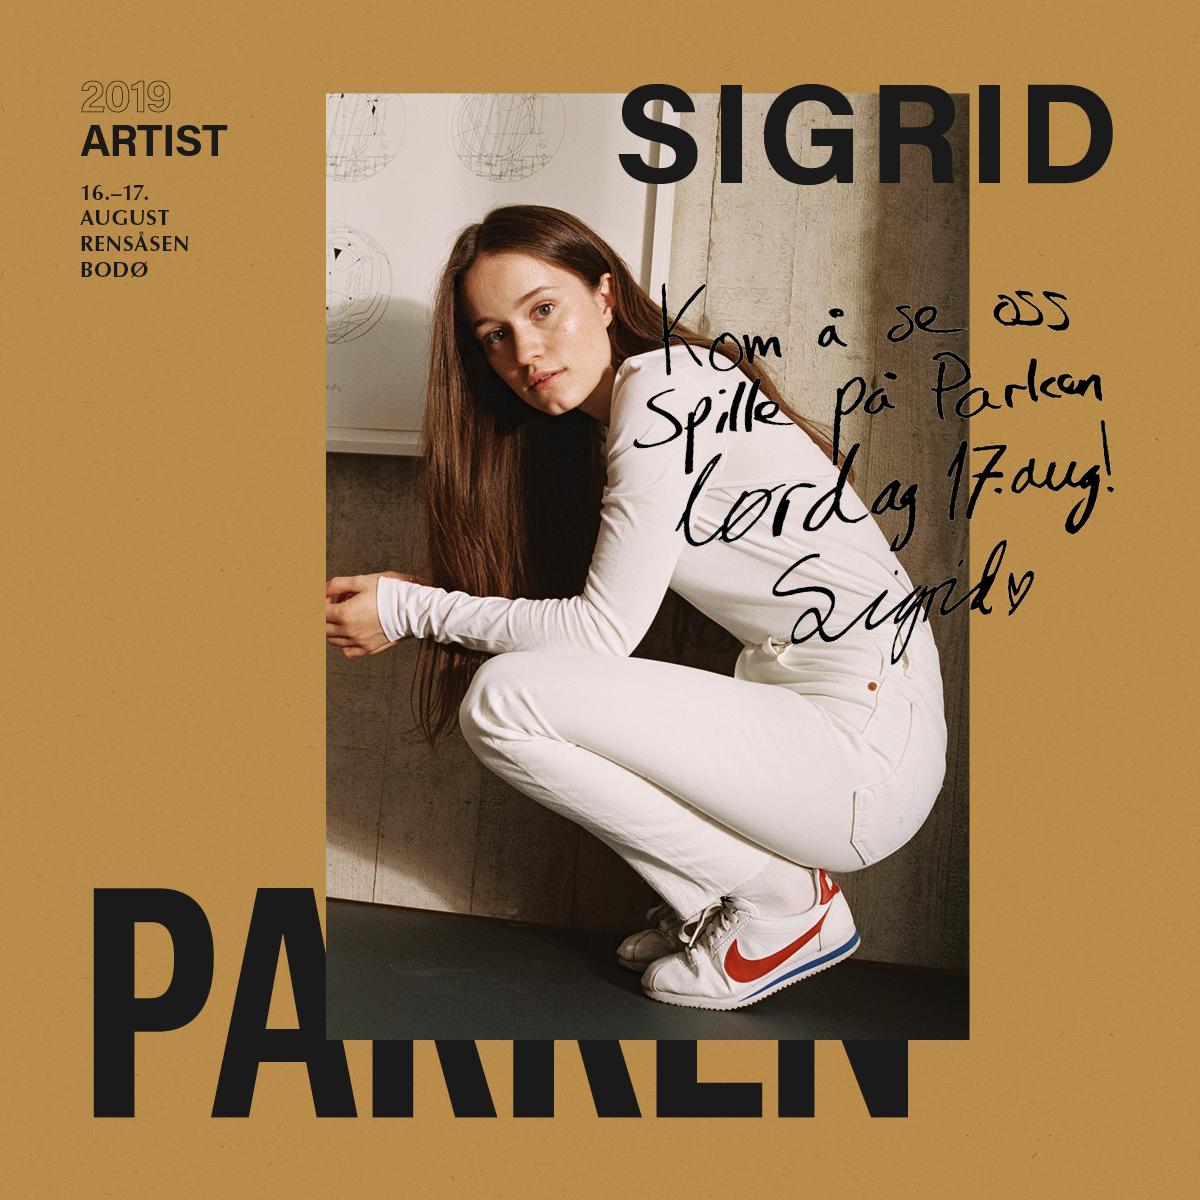 BYRAA_Parken_2019_Artistslipp_Sigrid_1200x1200px.jpg